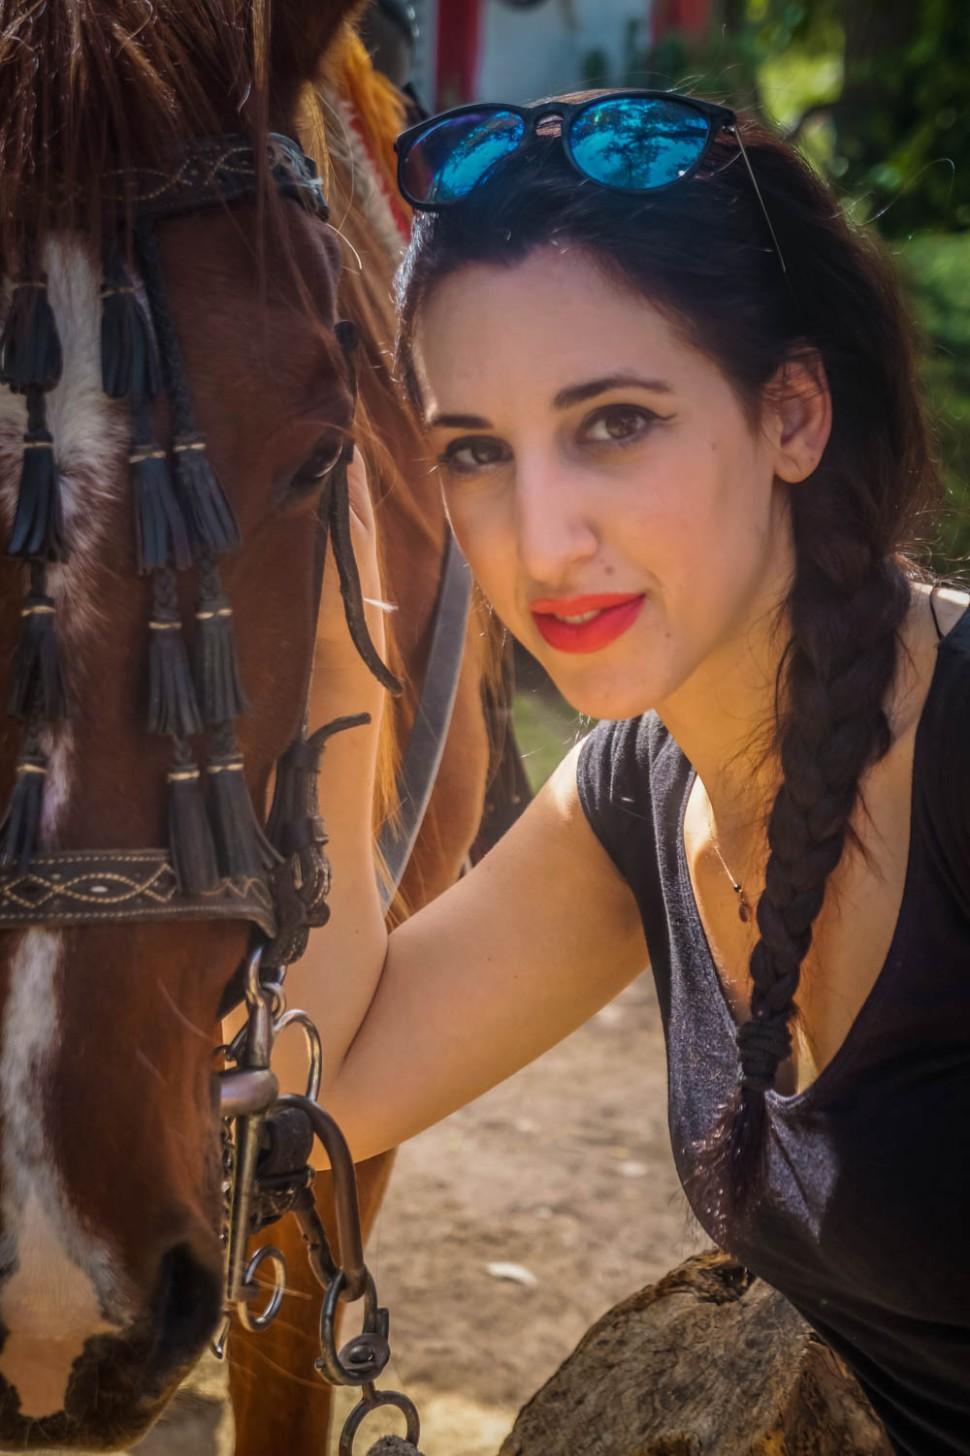 horseback-riding-pelion-greece-la-vie-en-blog-all-rights-reserved-18